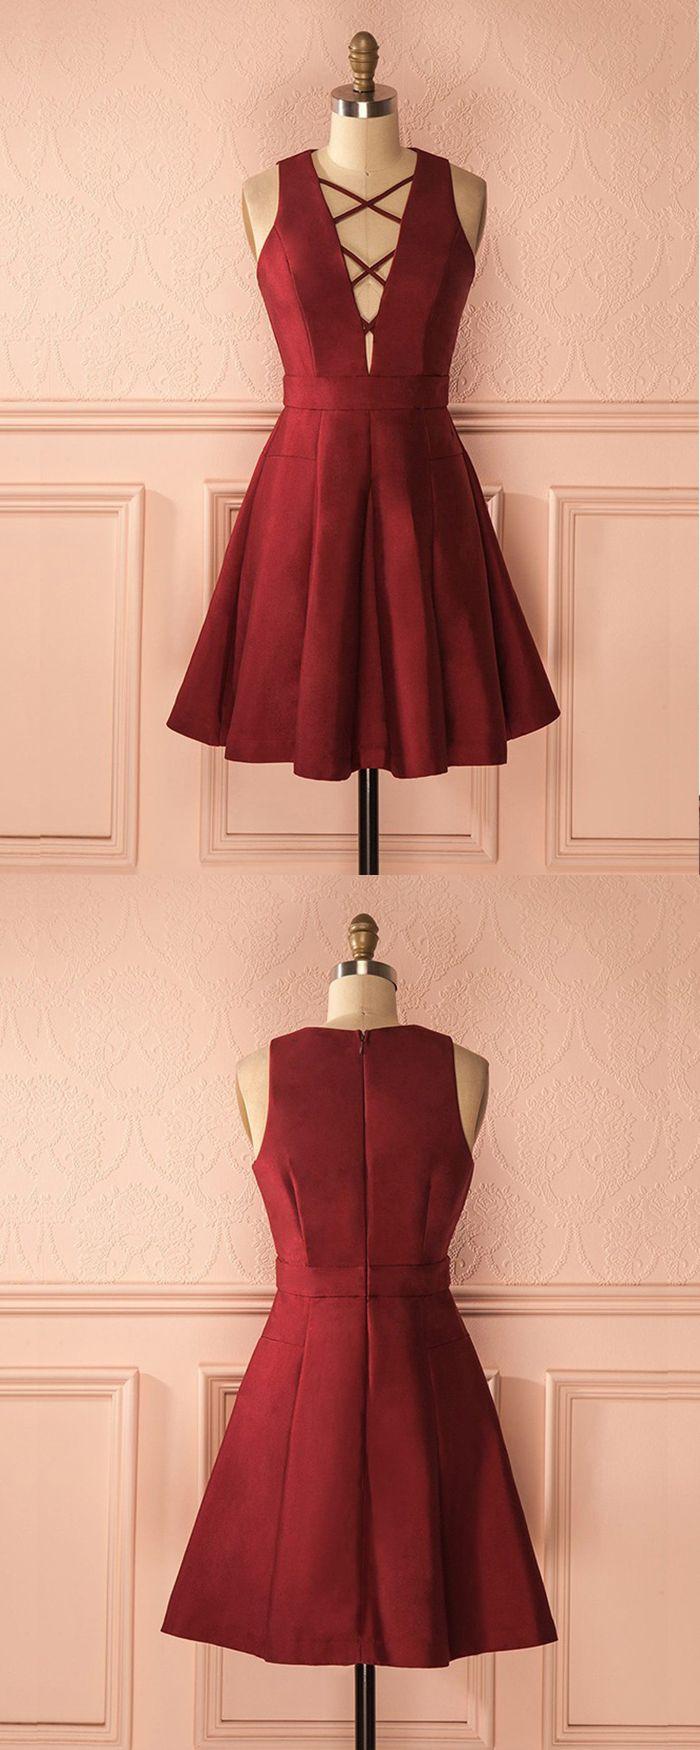 Simple crisscross satin burgundy short formal dress hd